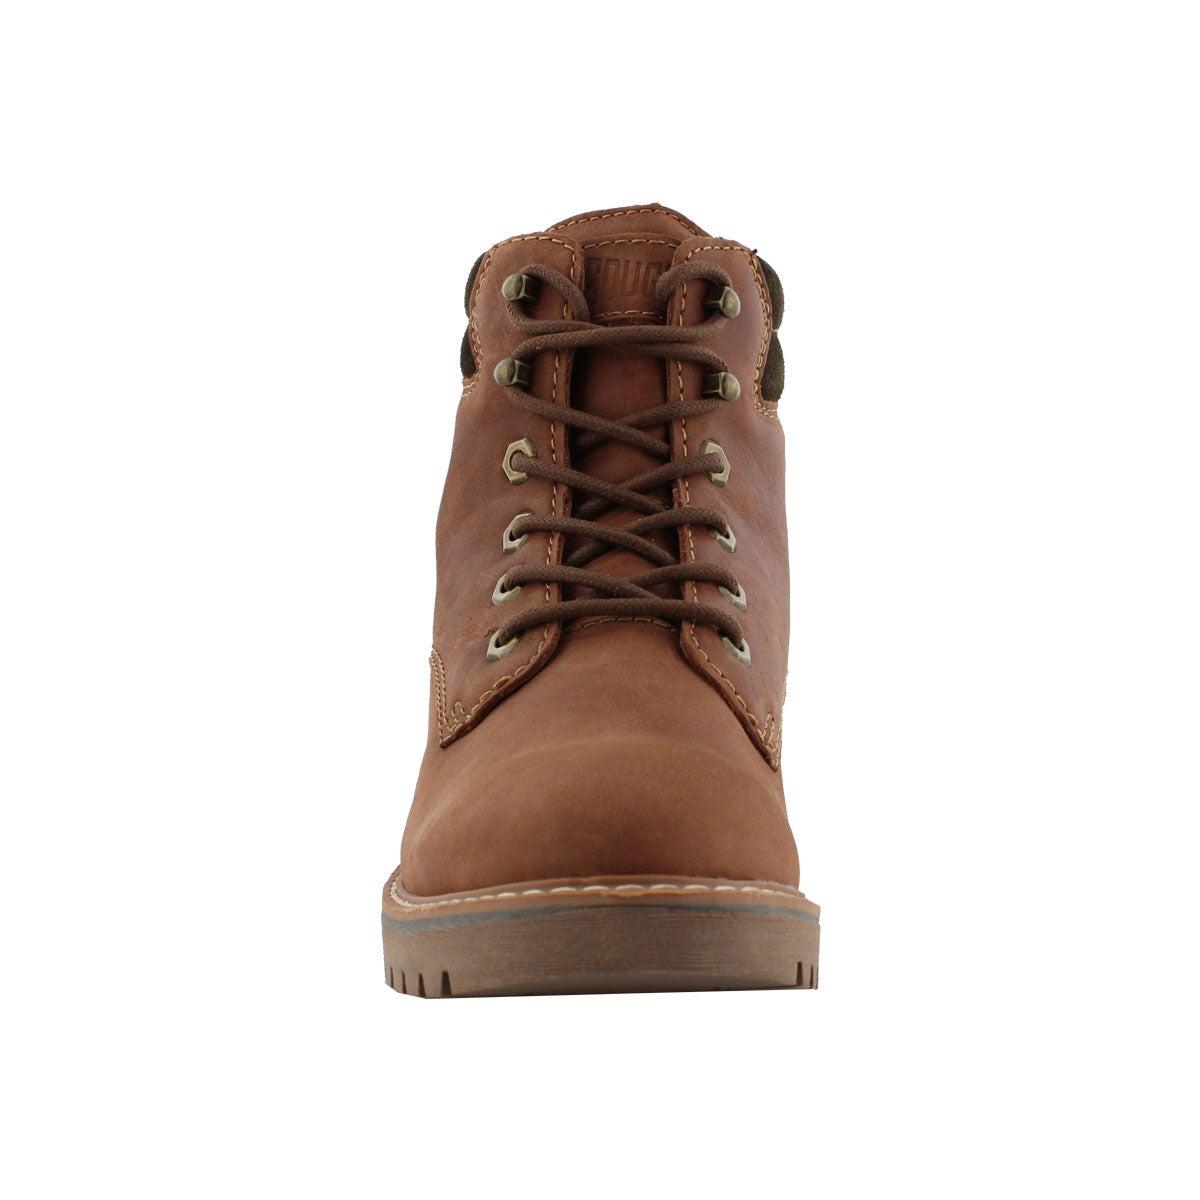 Lds Heston brn wtpf winter boot